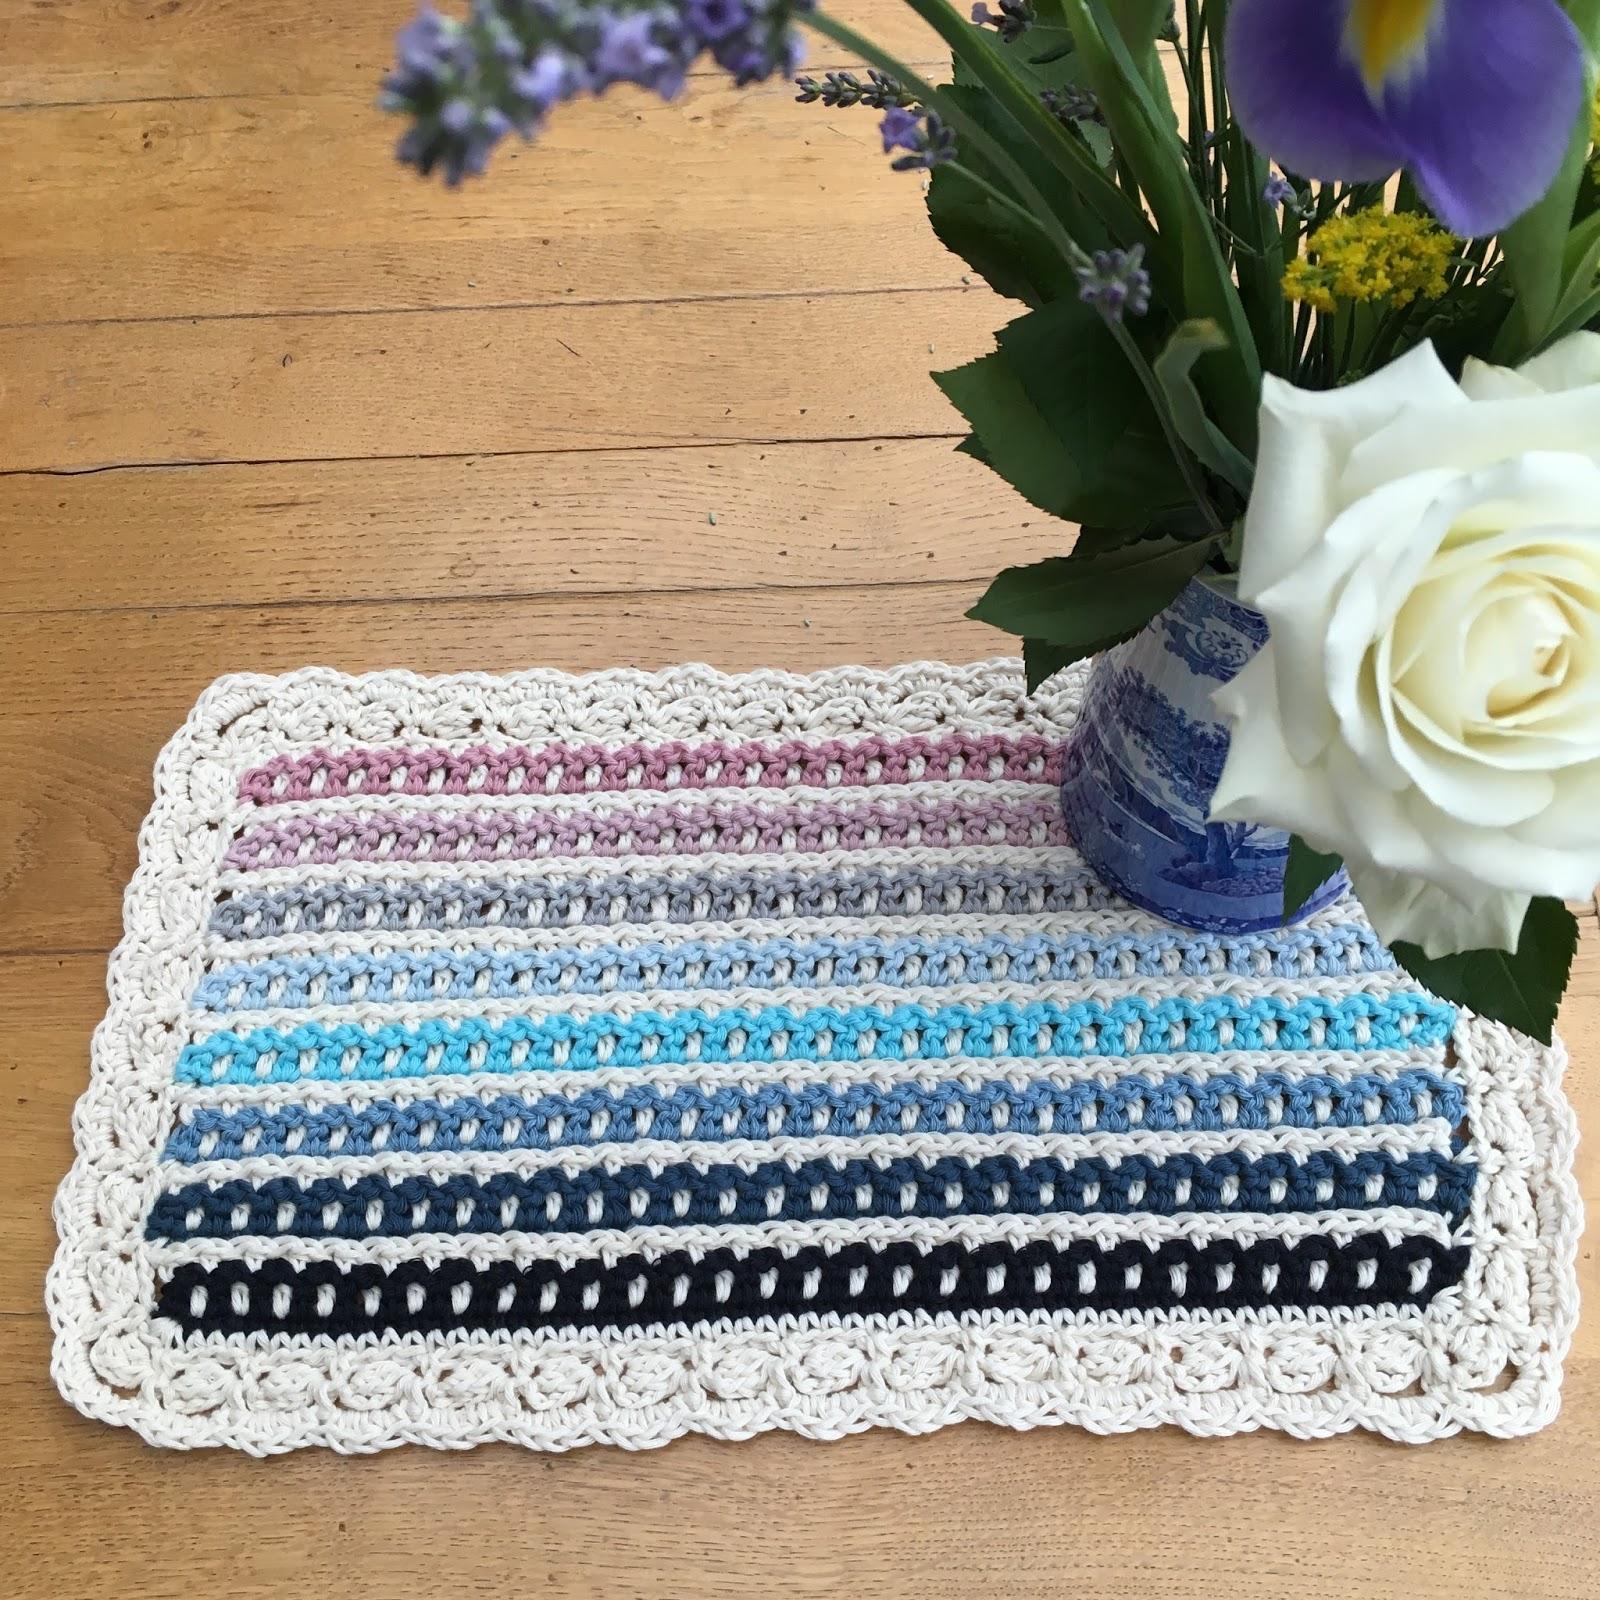 Felted Button - Colorful Crochet Patterns: Janus Blanket Crochet Pattern